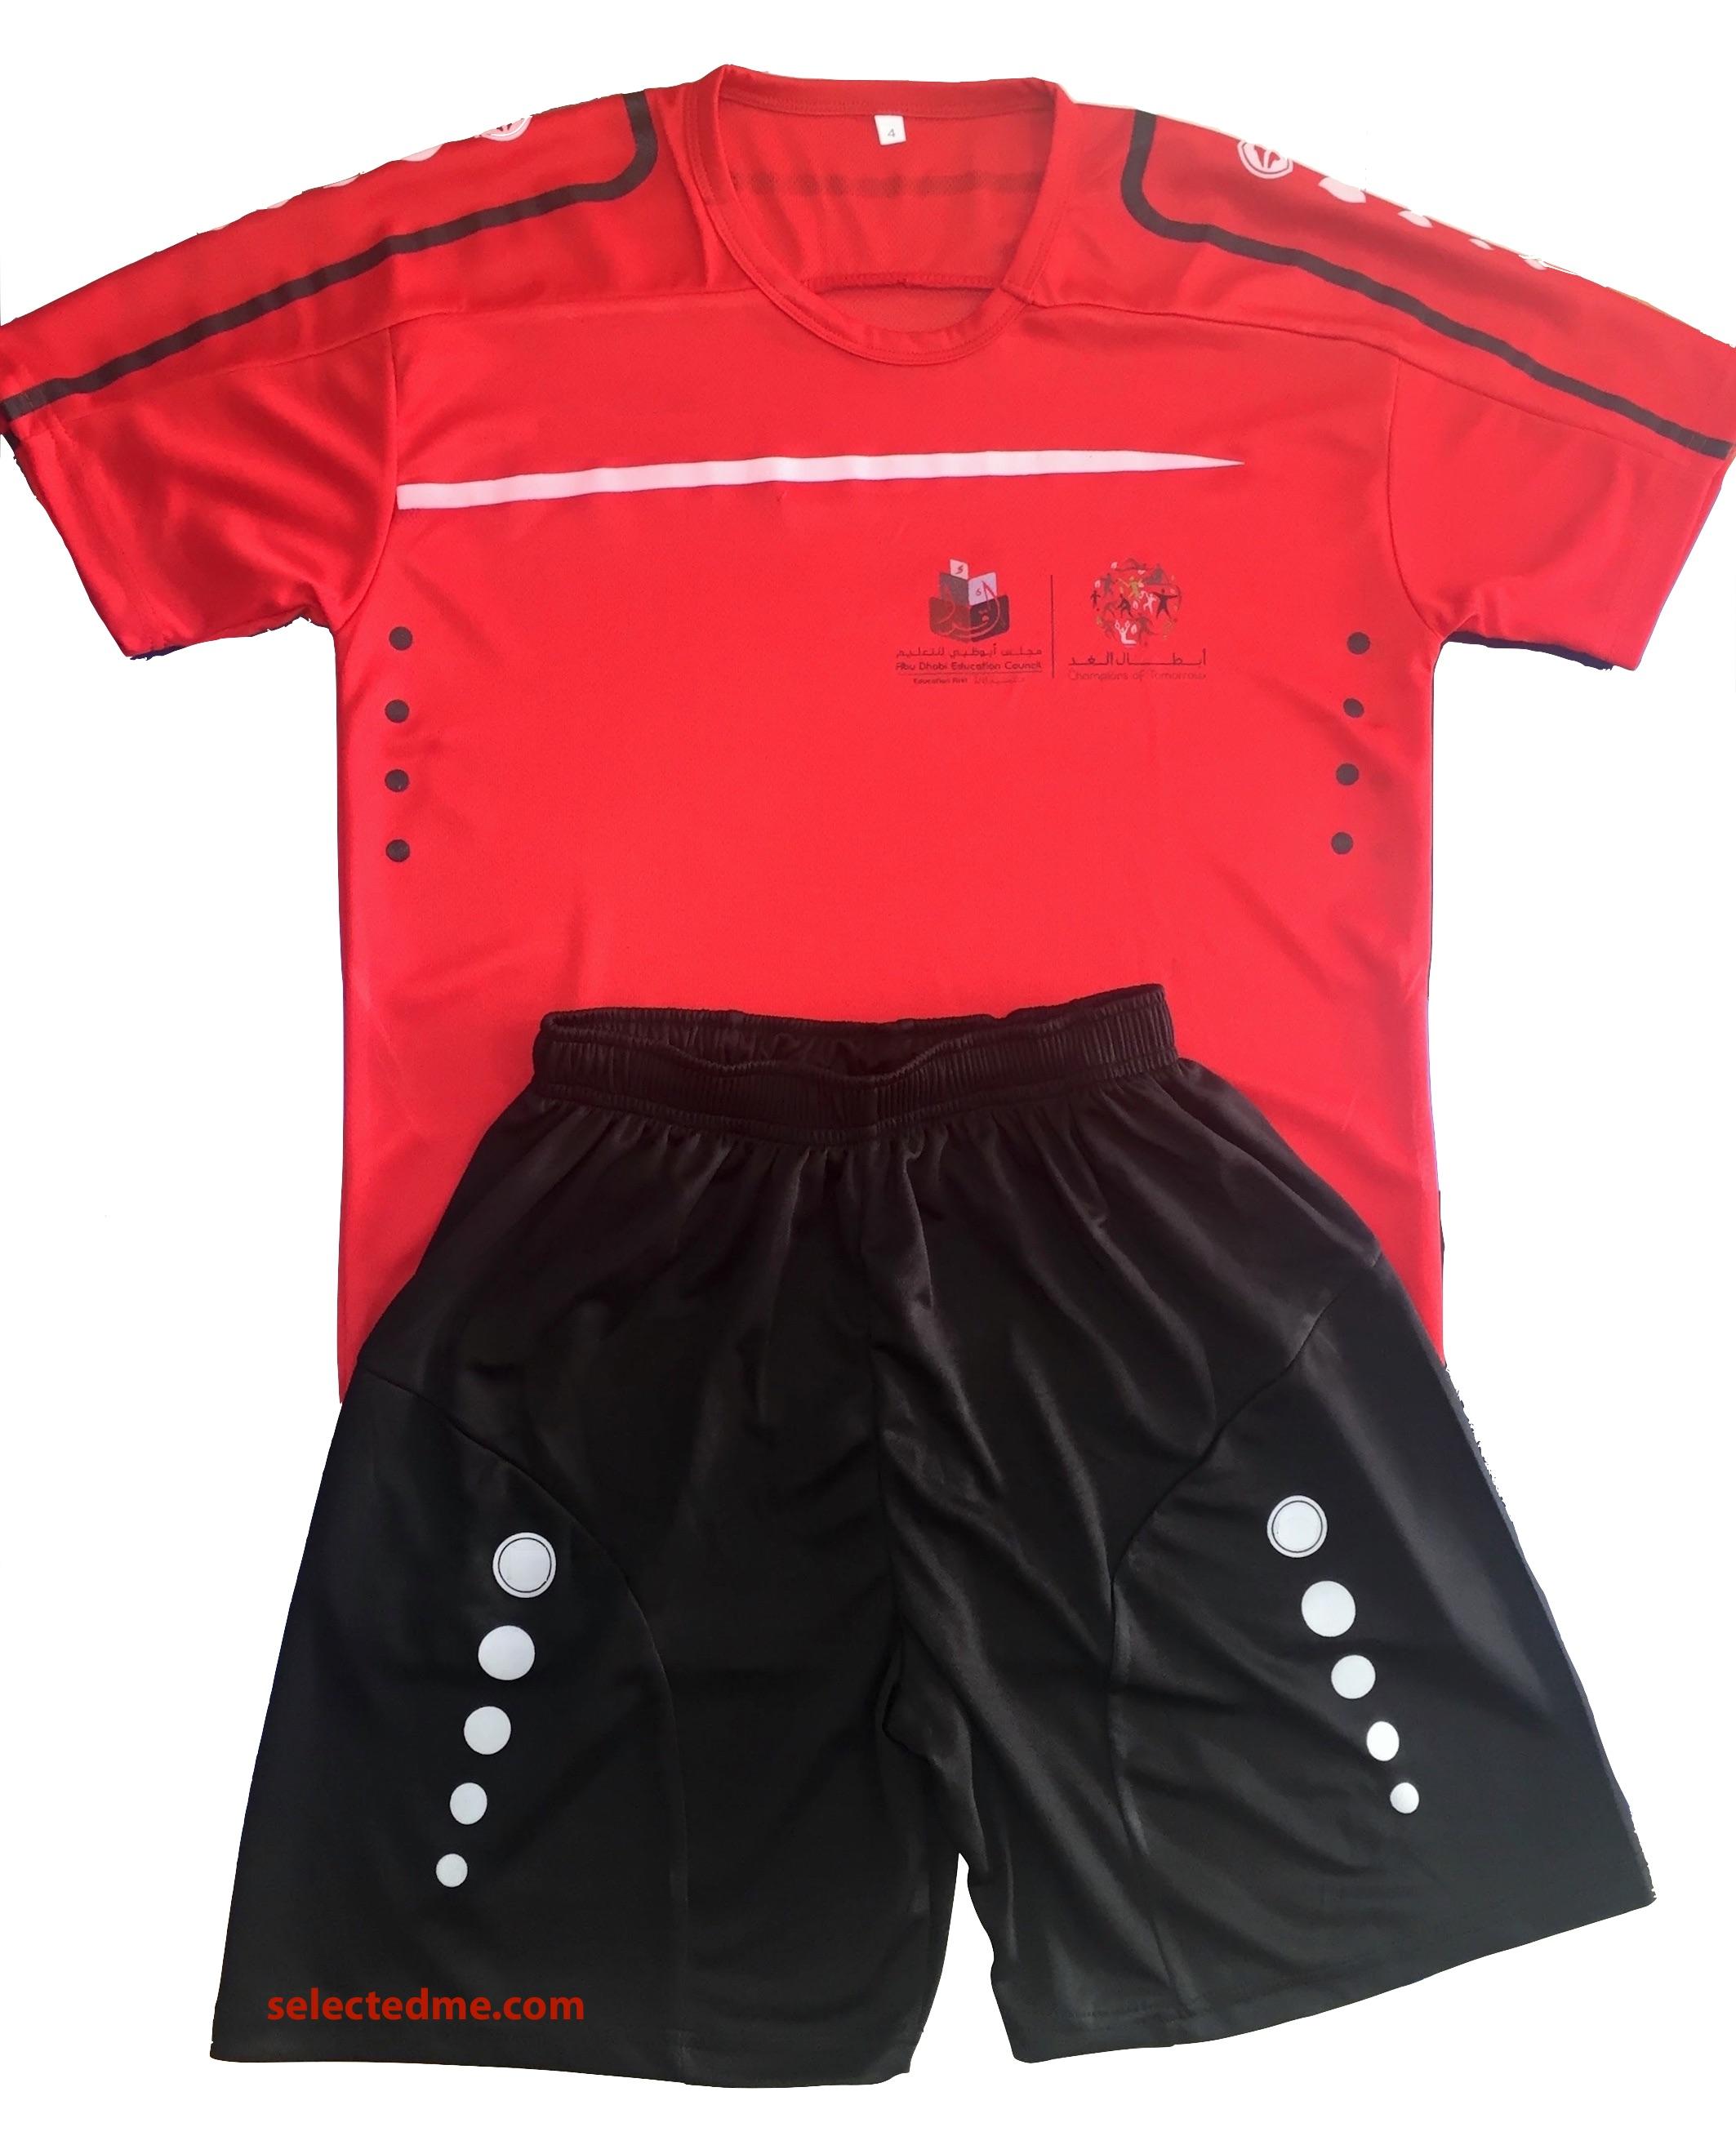 e97cc938 Sports T-shirts Tops & Bottom shorts custom made in Dubai UAE